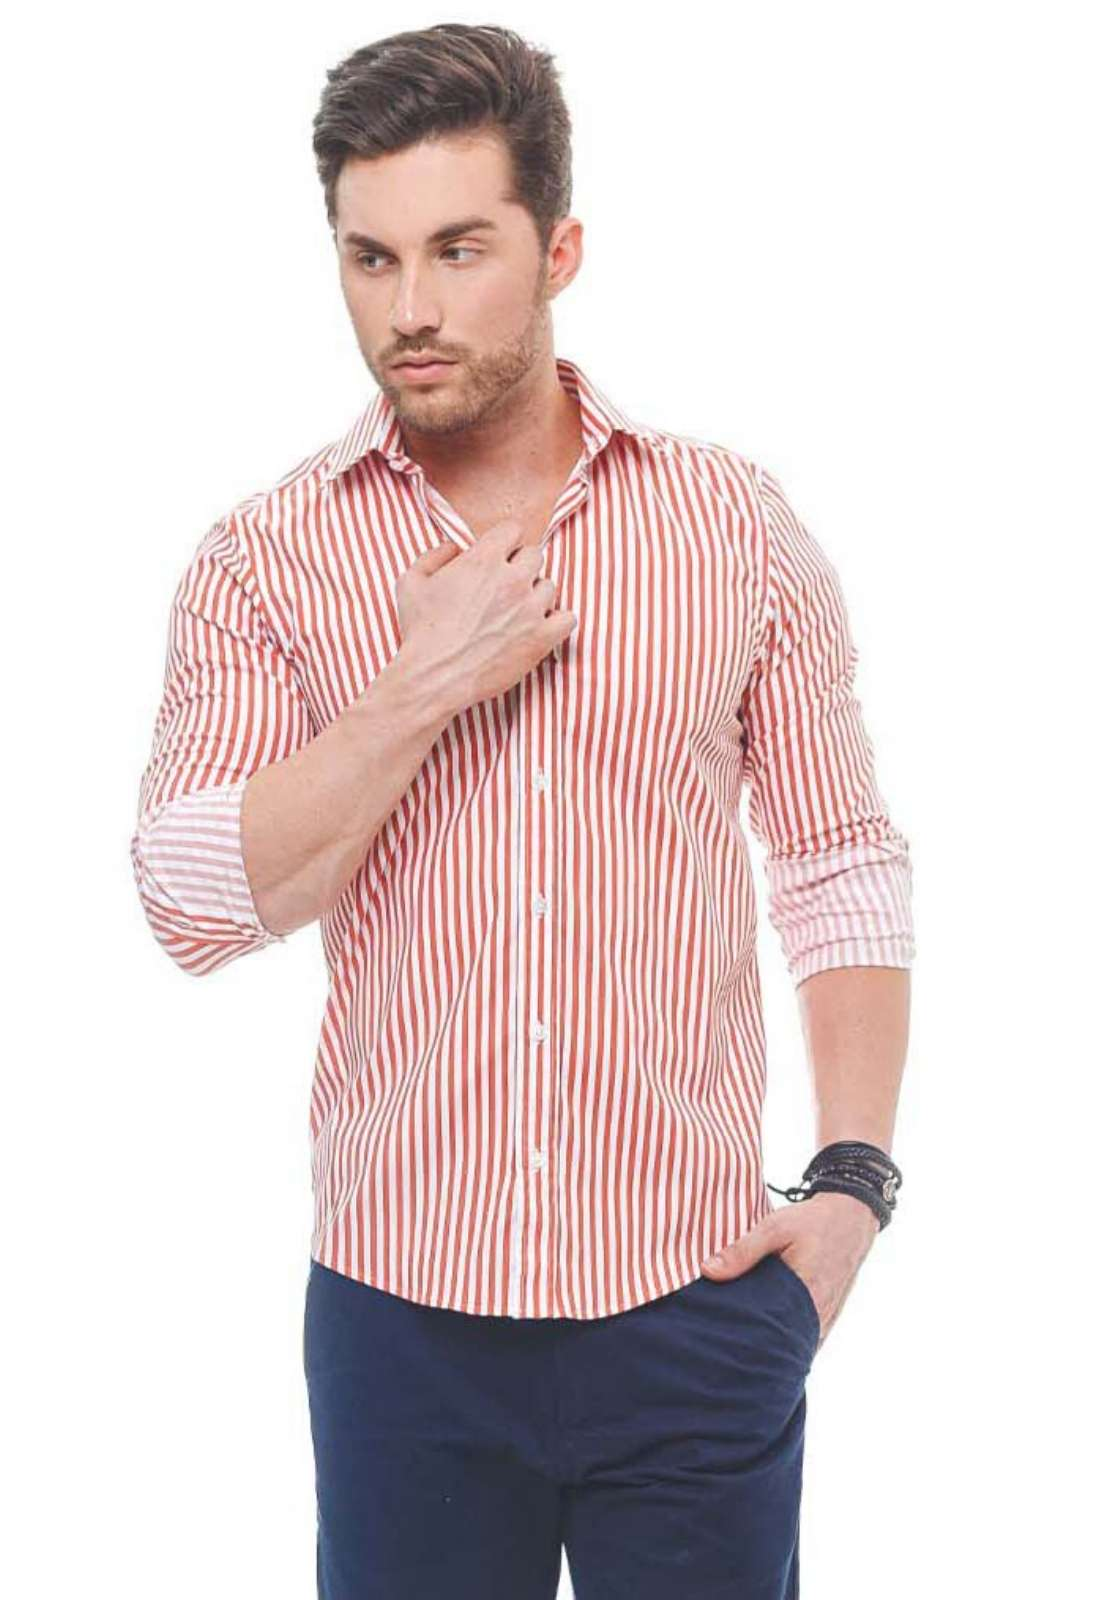 100281 - Camisa Social Masculina Slim Listra Vermelha - LEVOK